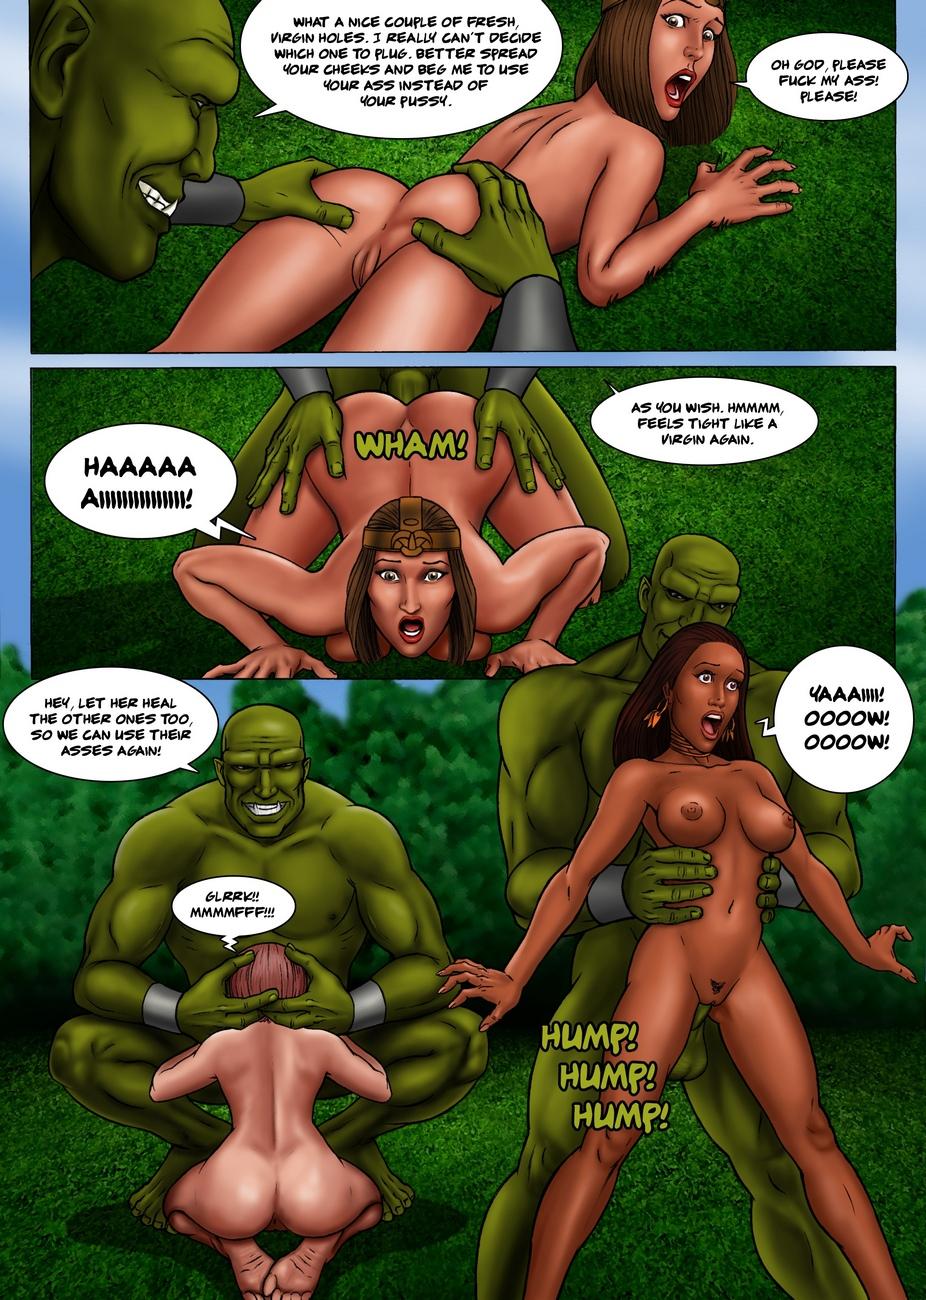 Baldur-s-Gape-Ogres-Assfuck-Their-Enemies-Dry 23 free sex comic